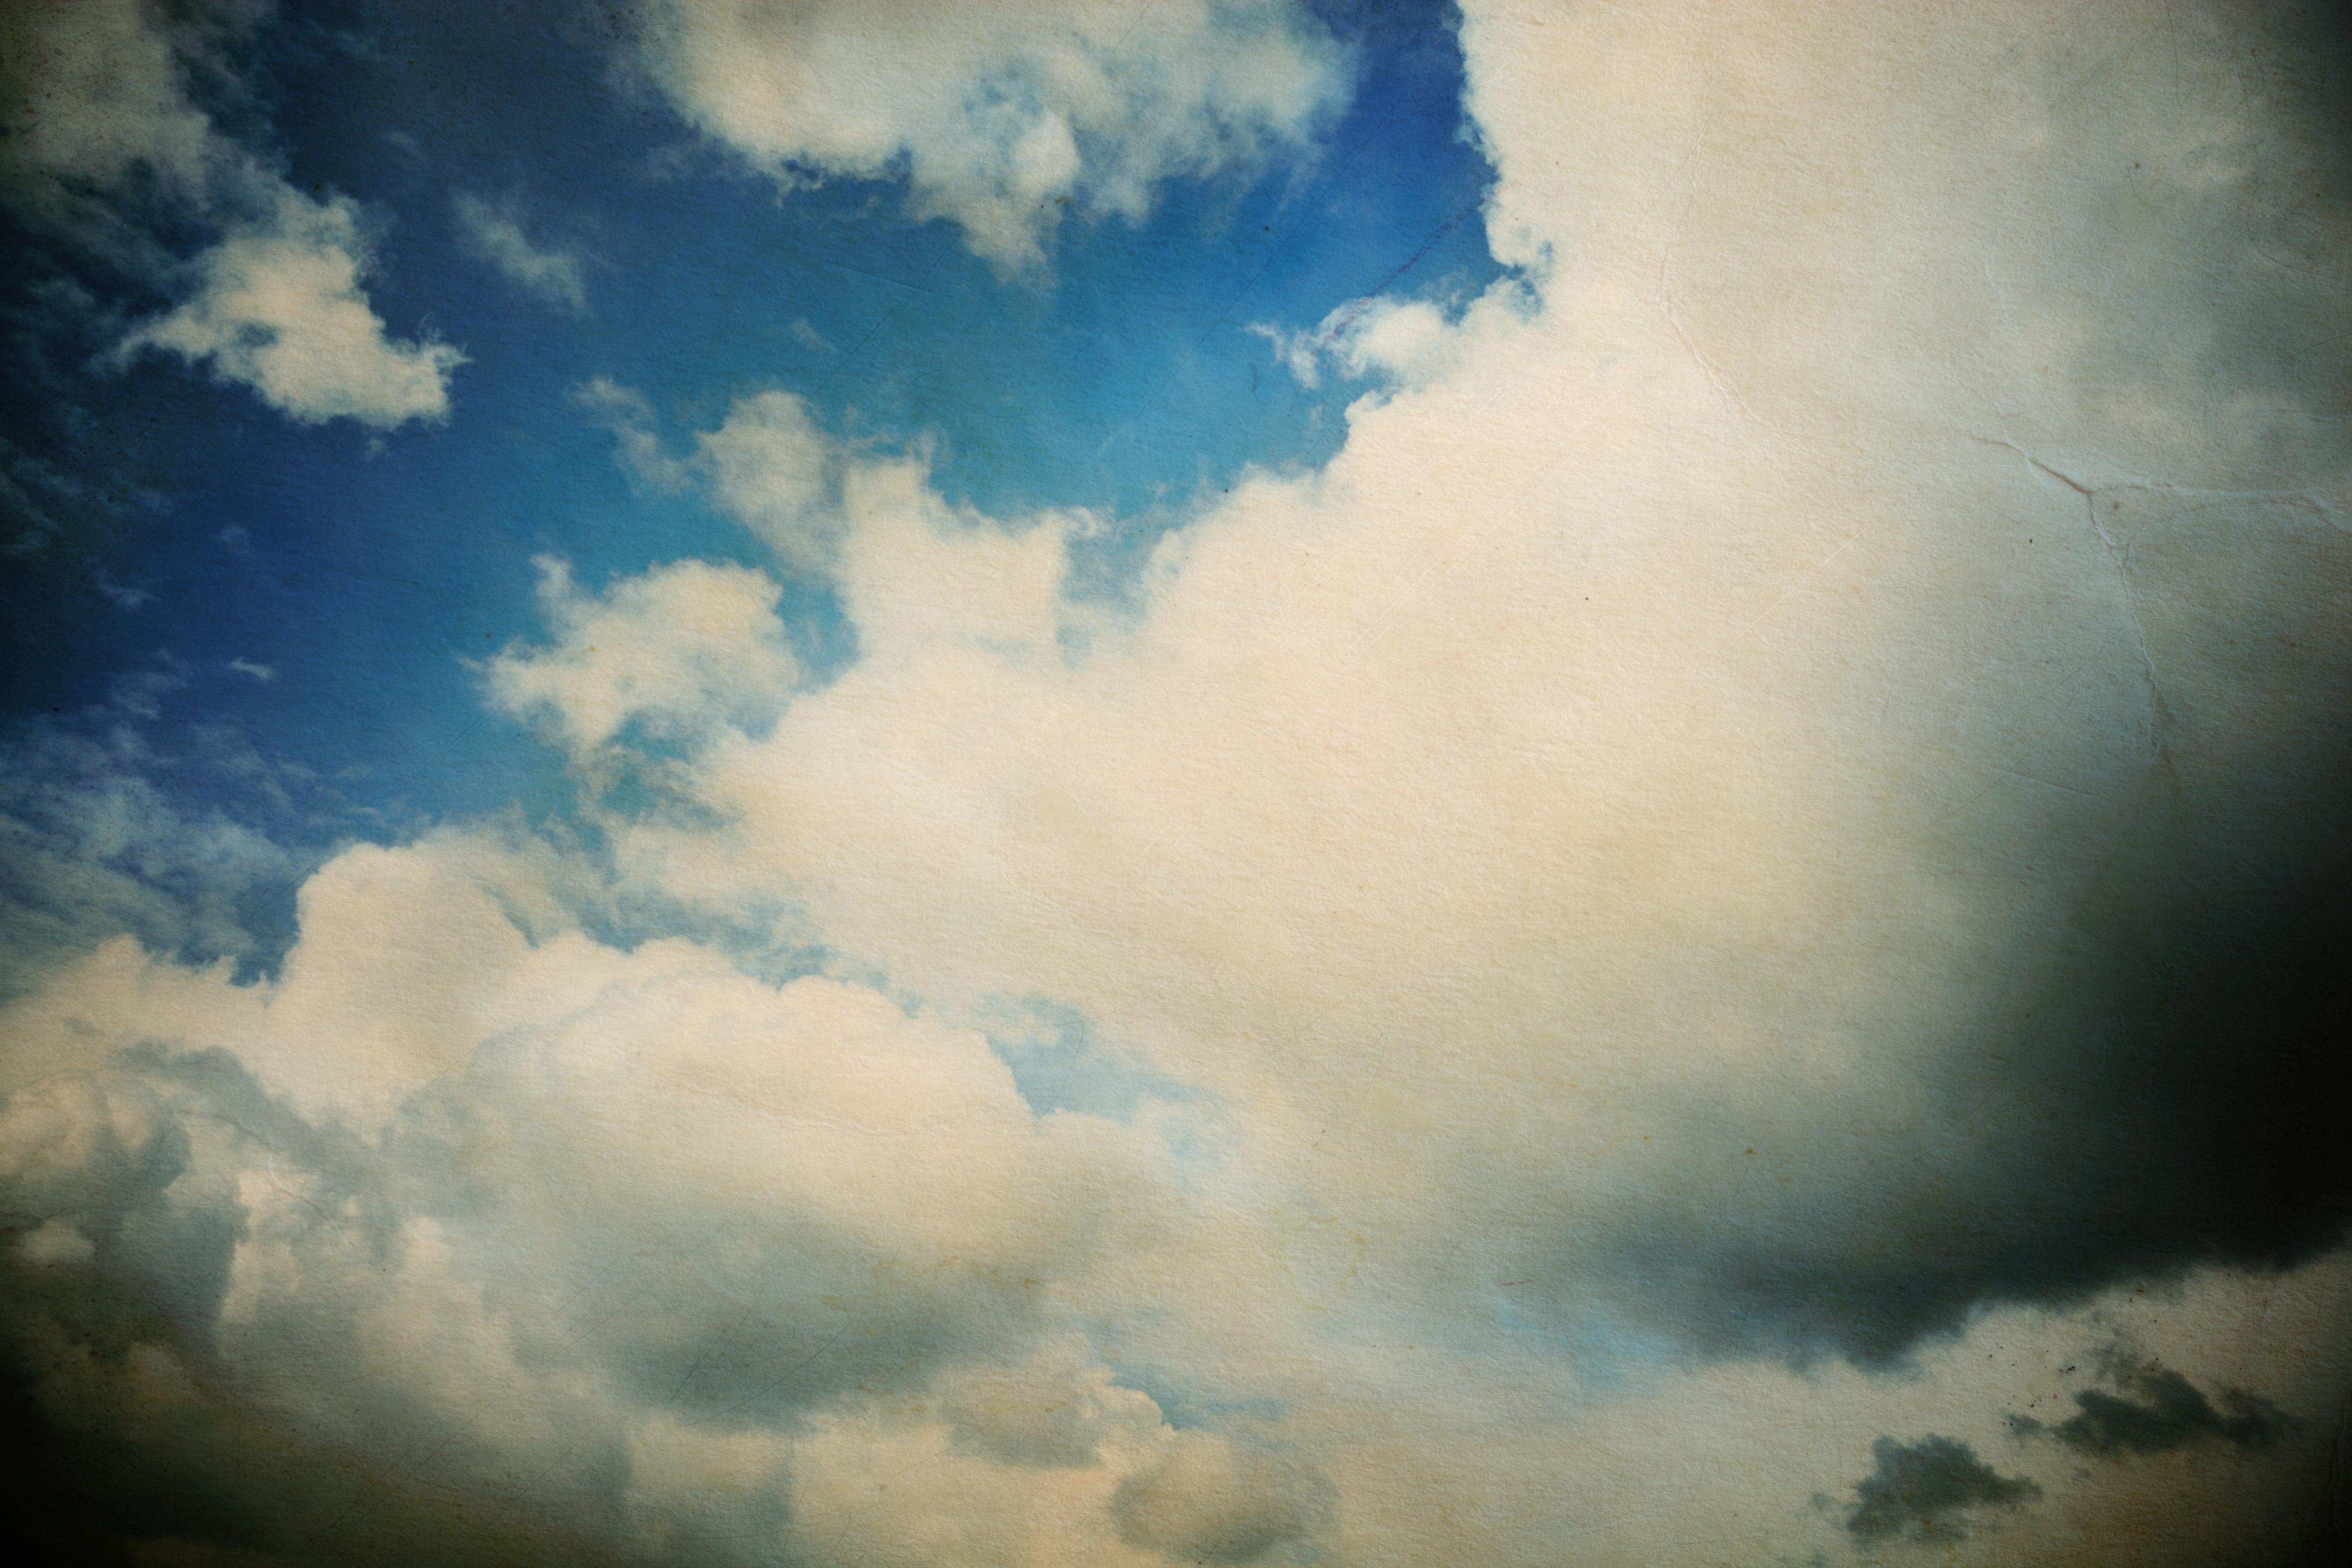 Free Stormy Weather Desktop Wallpaper